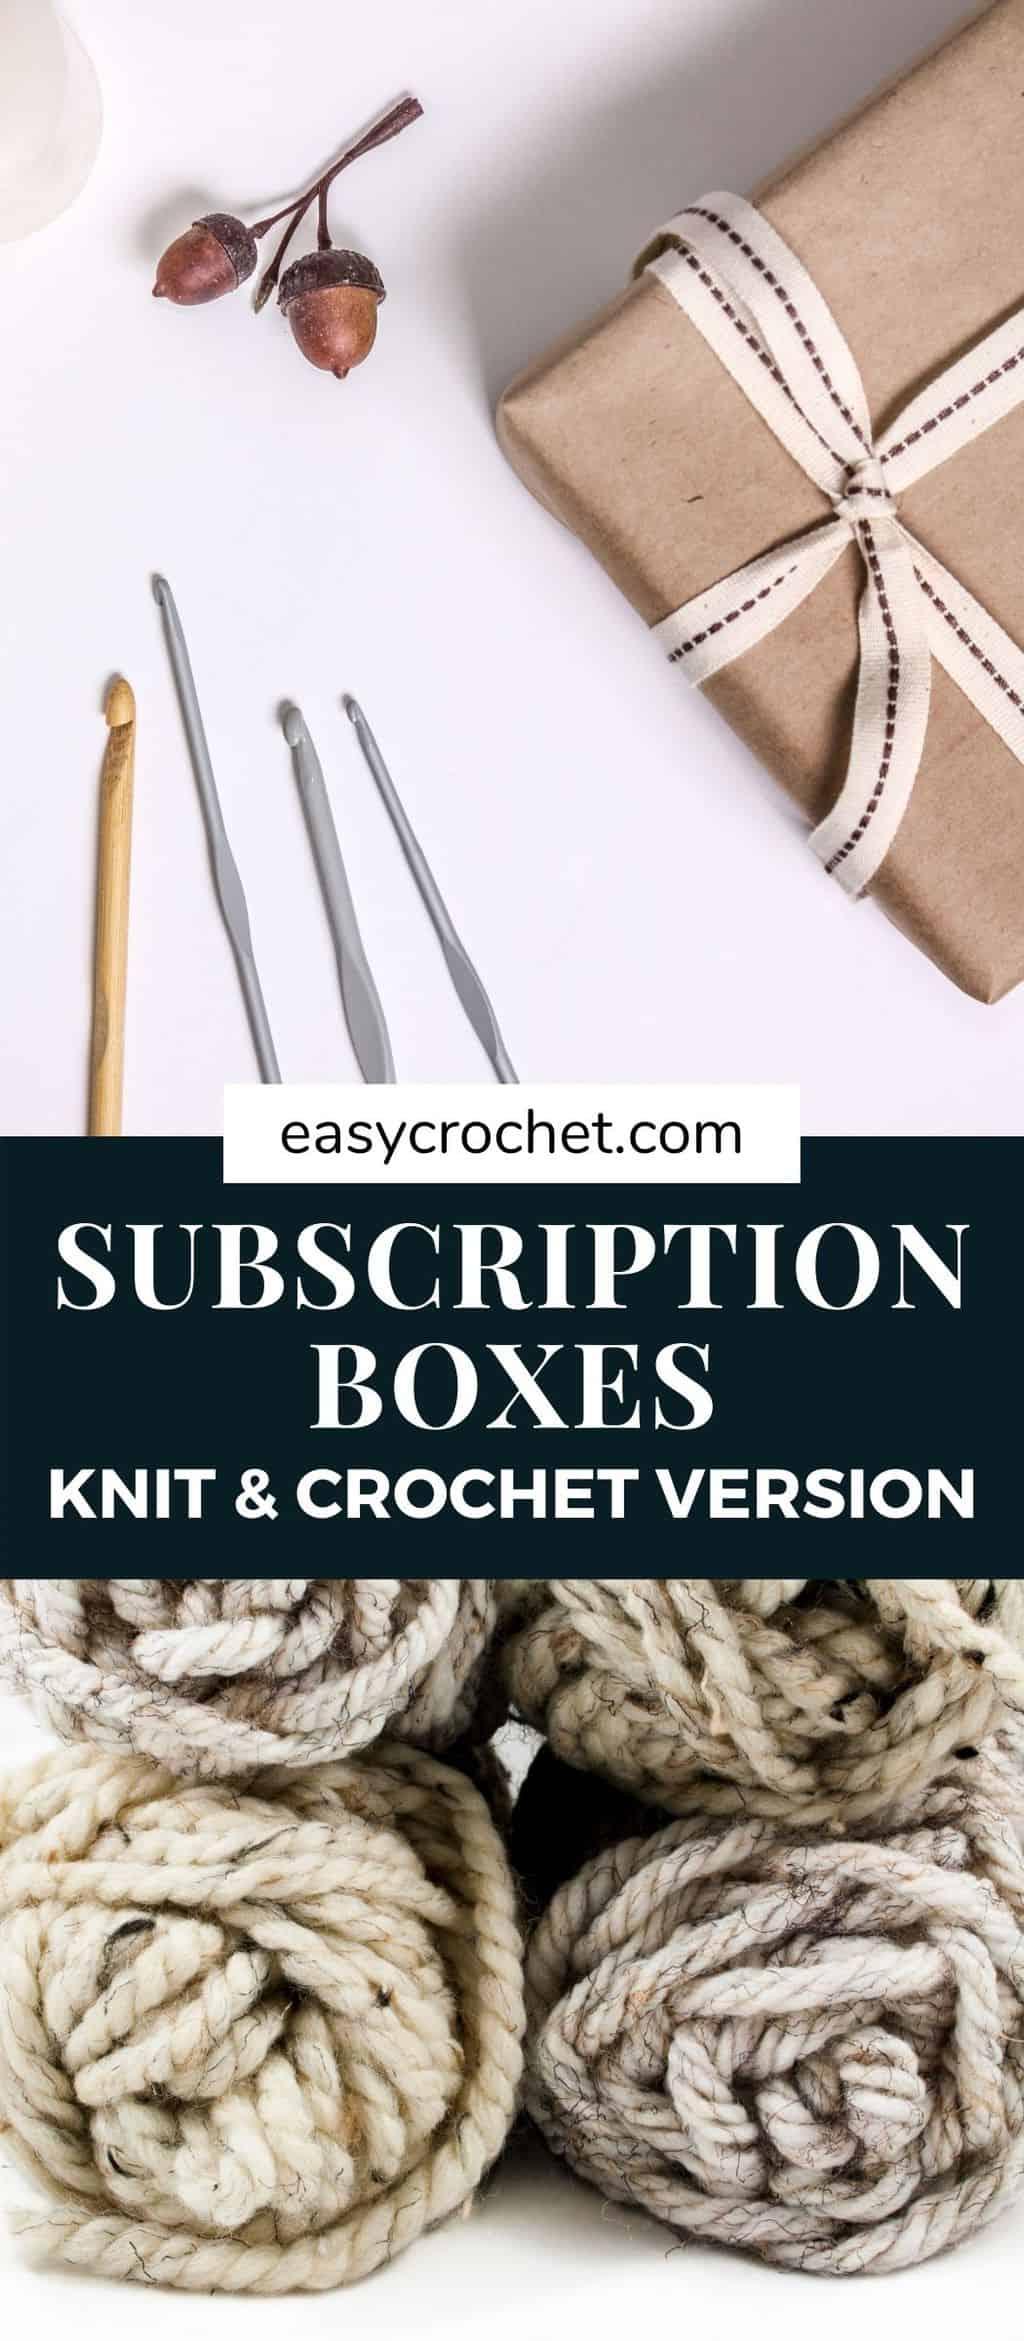 yarn crochet knit subscription boxes via @easycrochetcom